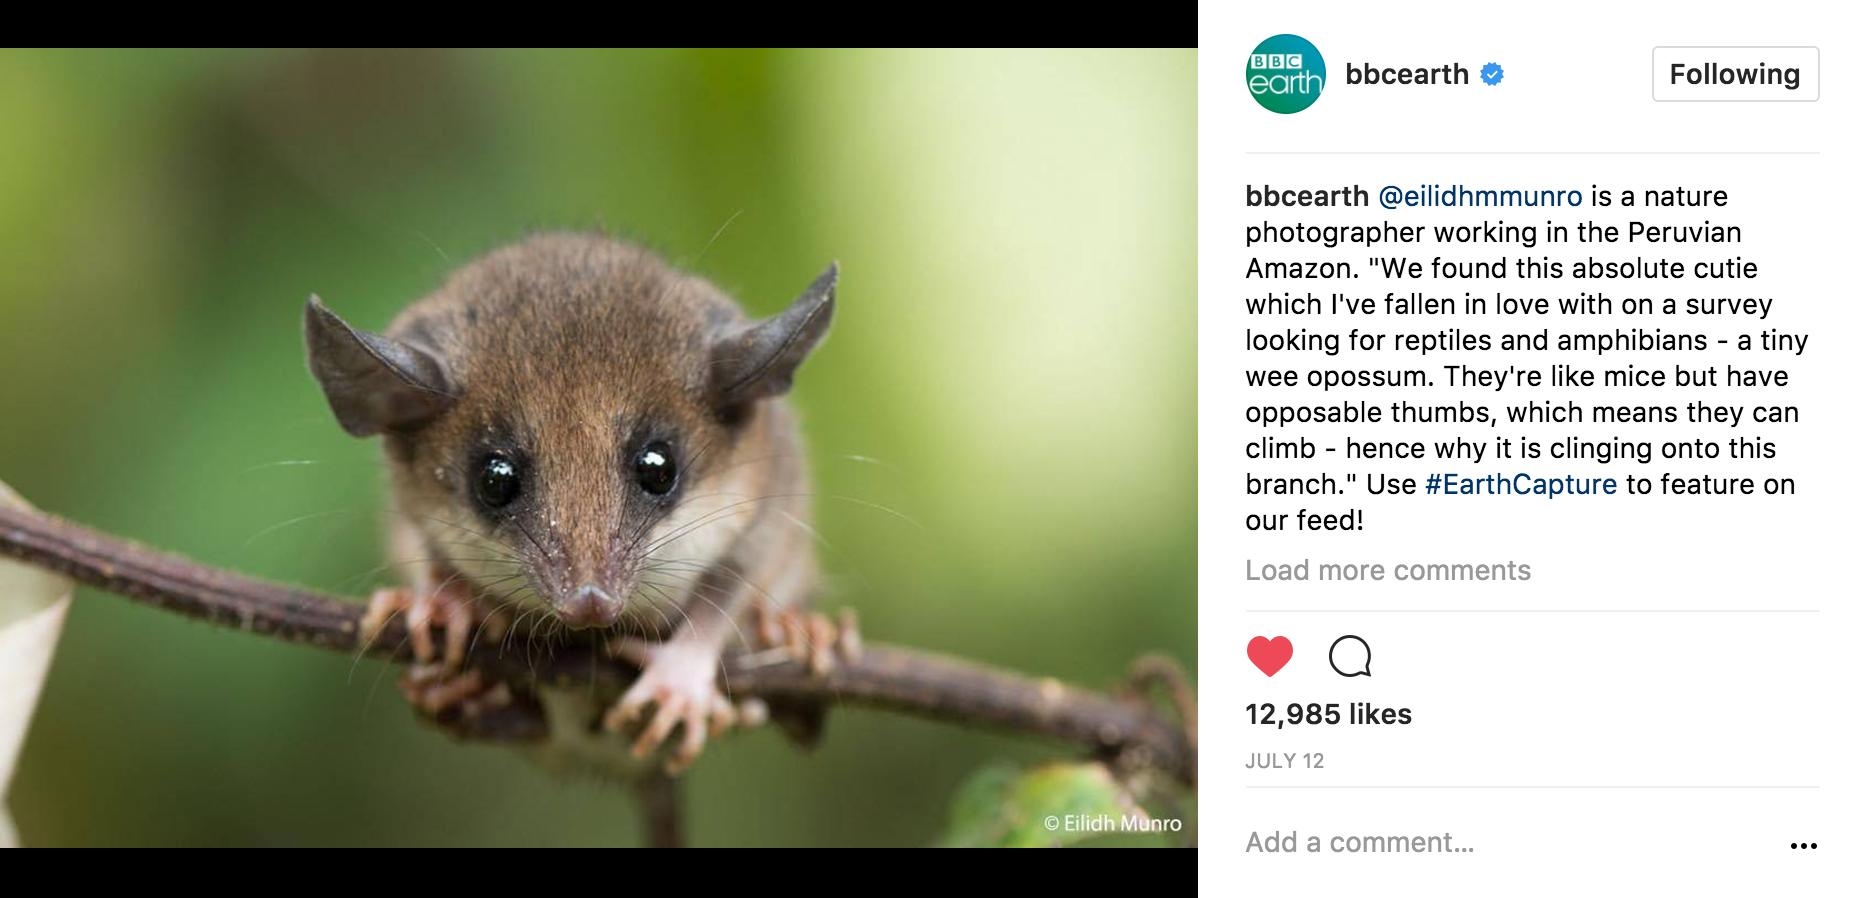 bbc-earth-eilidh-munro